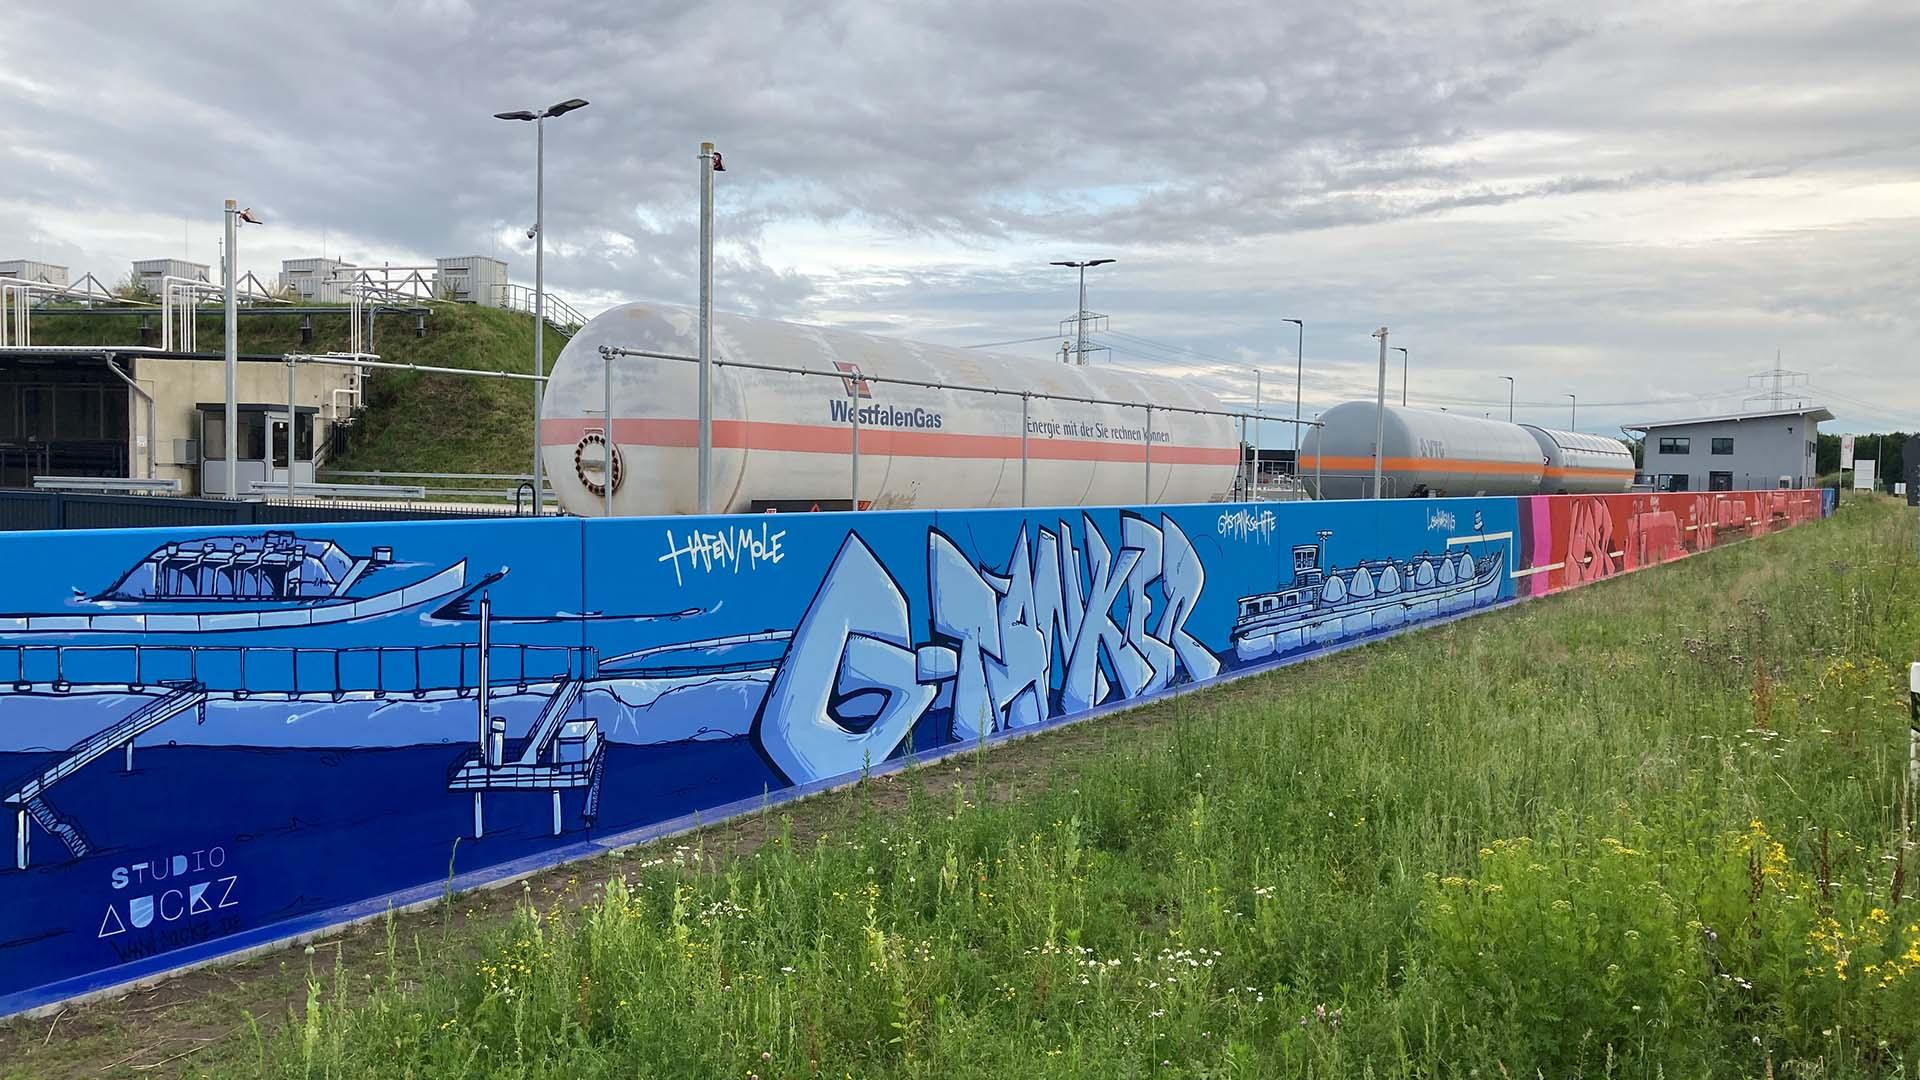 Fassade, Graffiti, Caratgas, Unternehmen, Firma, Krefeld, Gaswerk